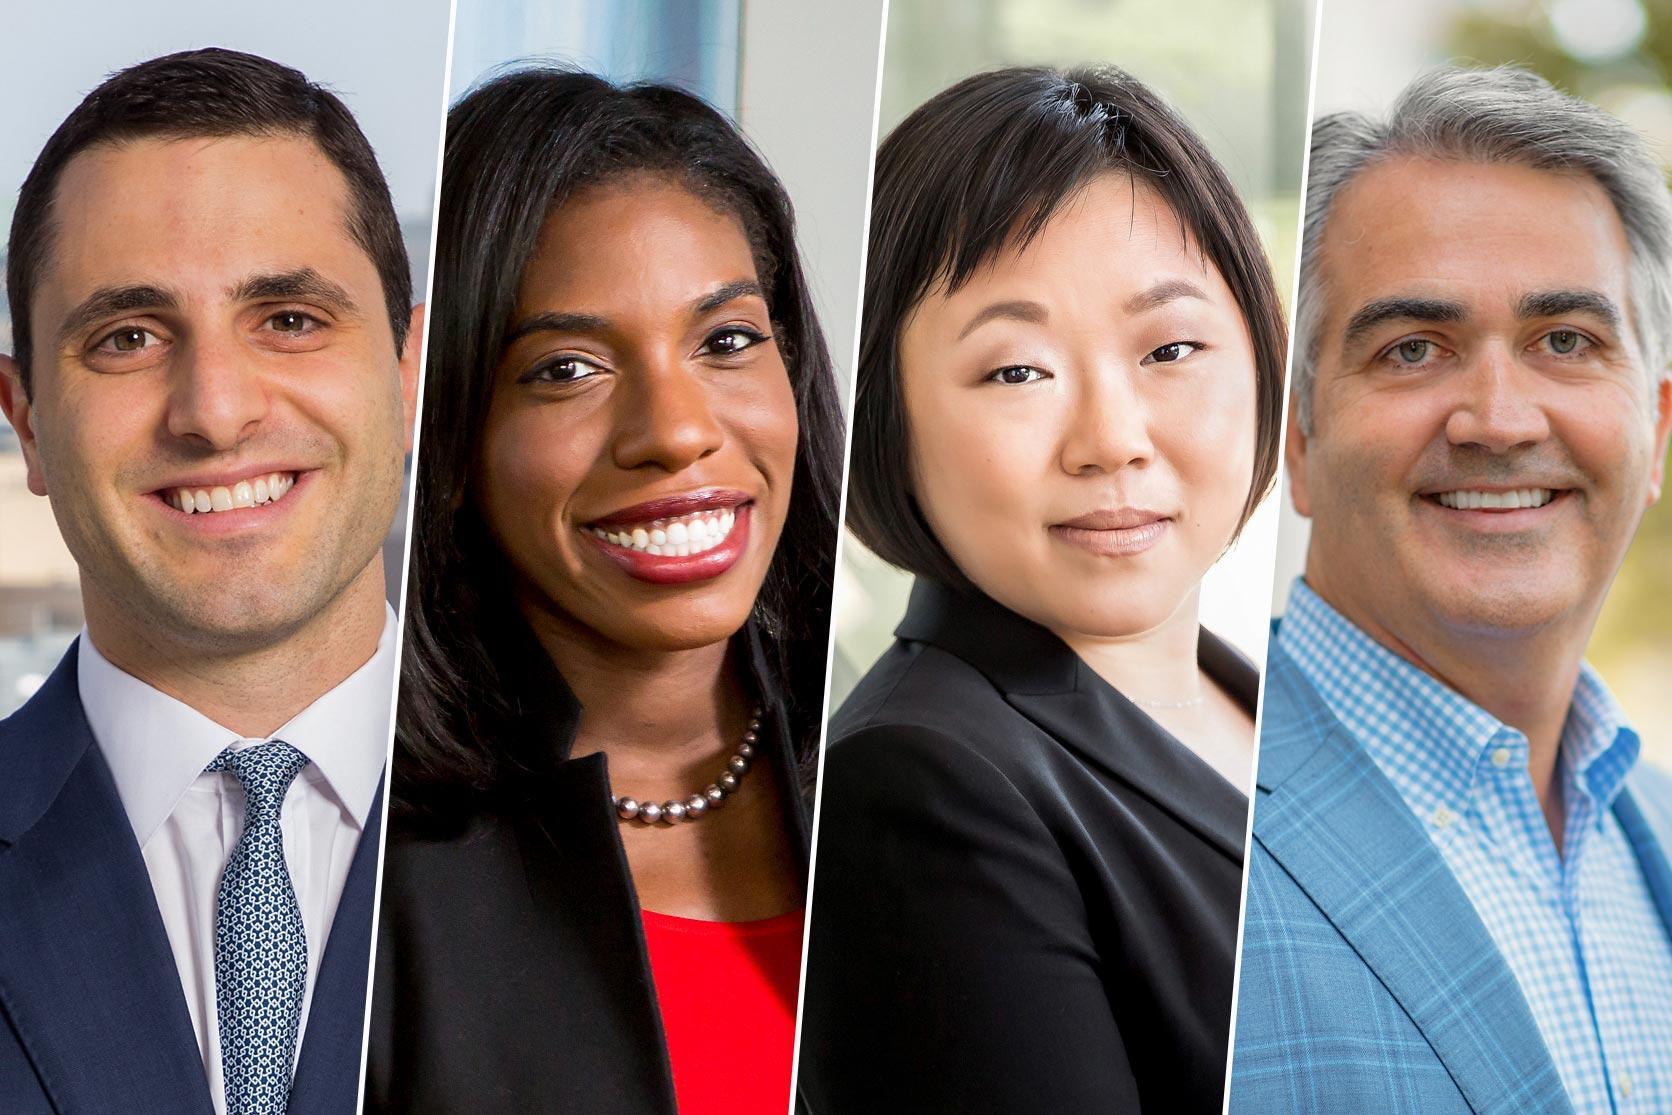 Jake Gutwillig (Class of 2013), Ashaki Noni Holmes-Kidd (Class of 2008), Tanya S. Wang (Class of 2003) and Douglas Eckert (Class of 1993) share their experiences since graduation.